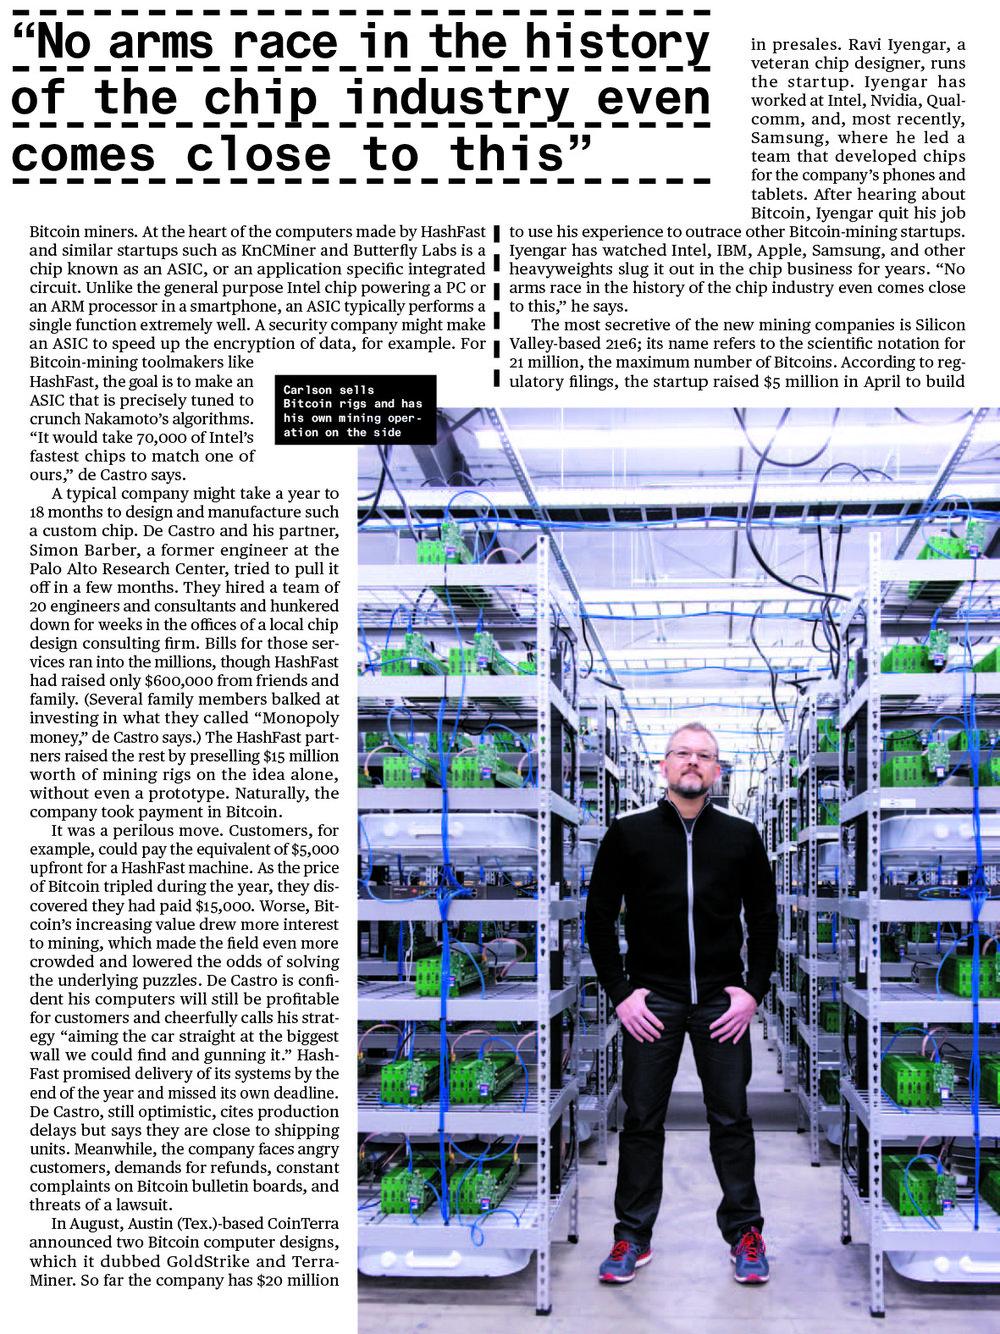 Dave Carlson for Bloomberg Businessweek